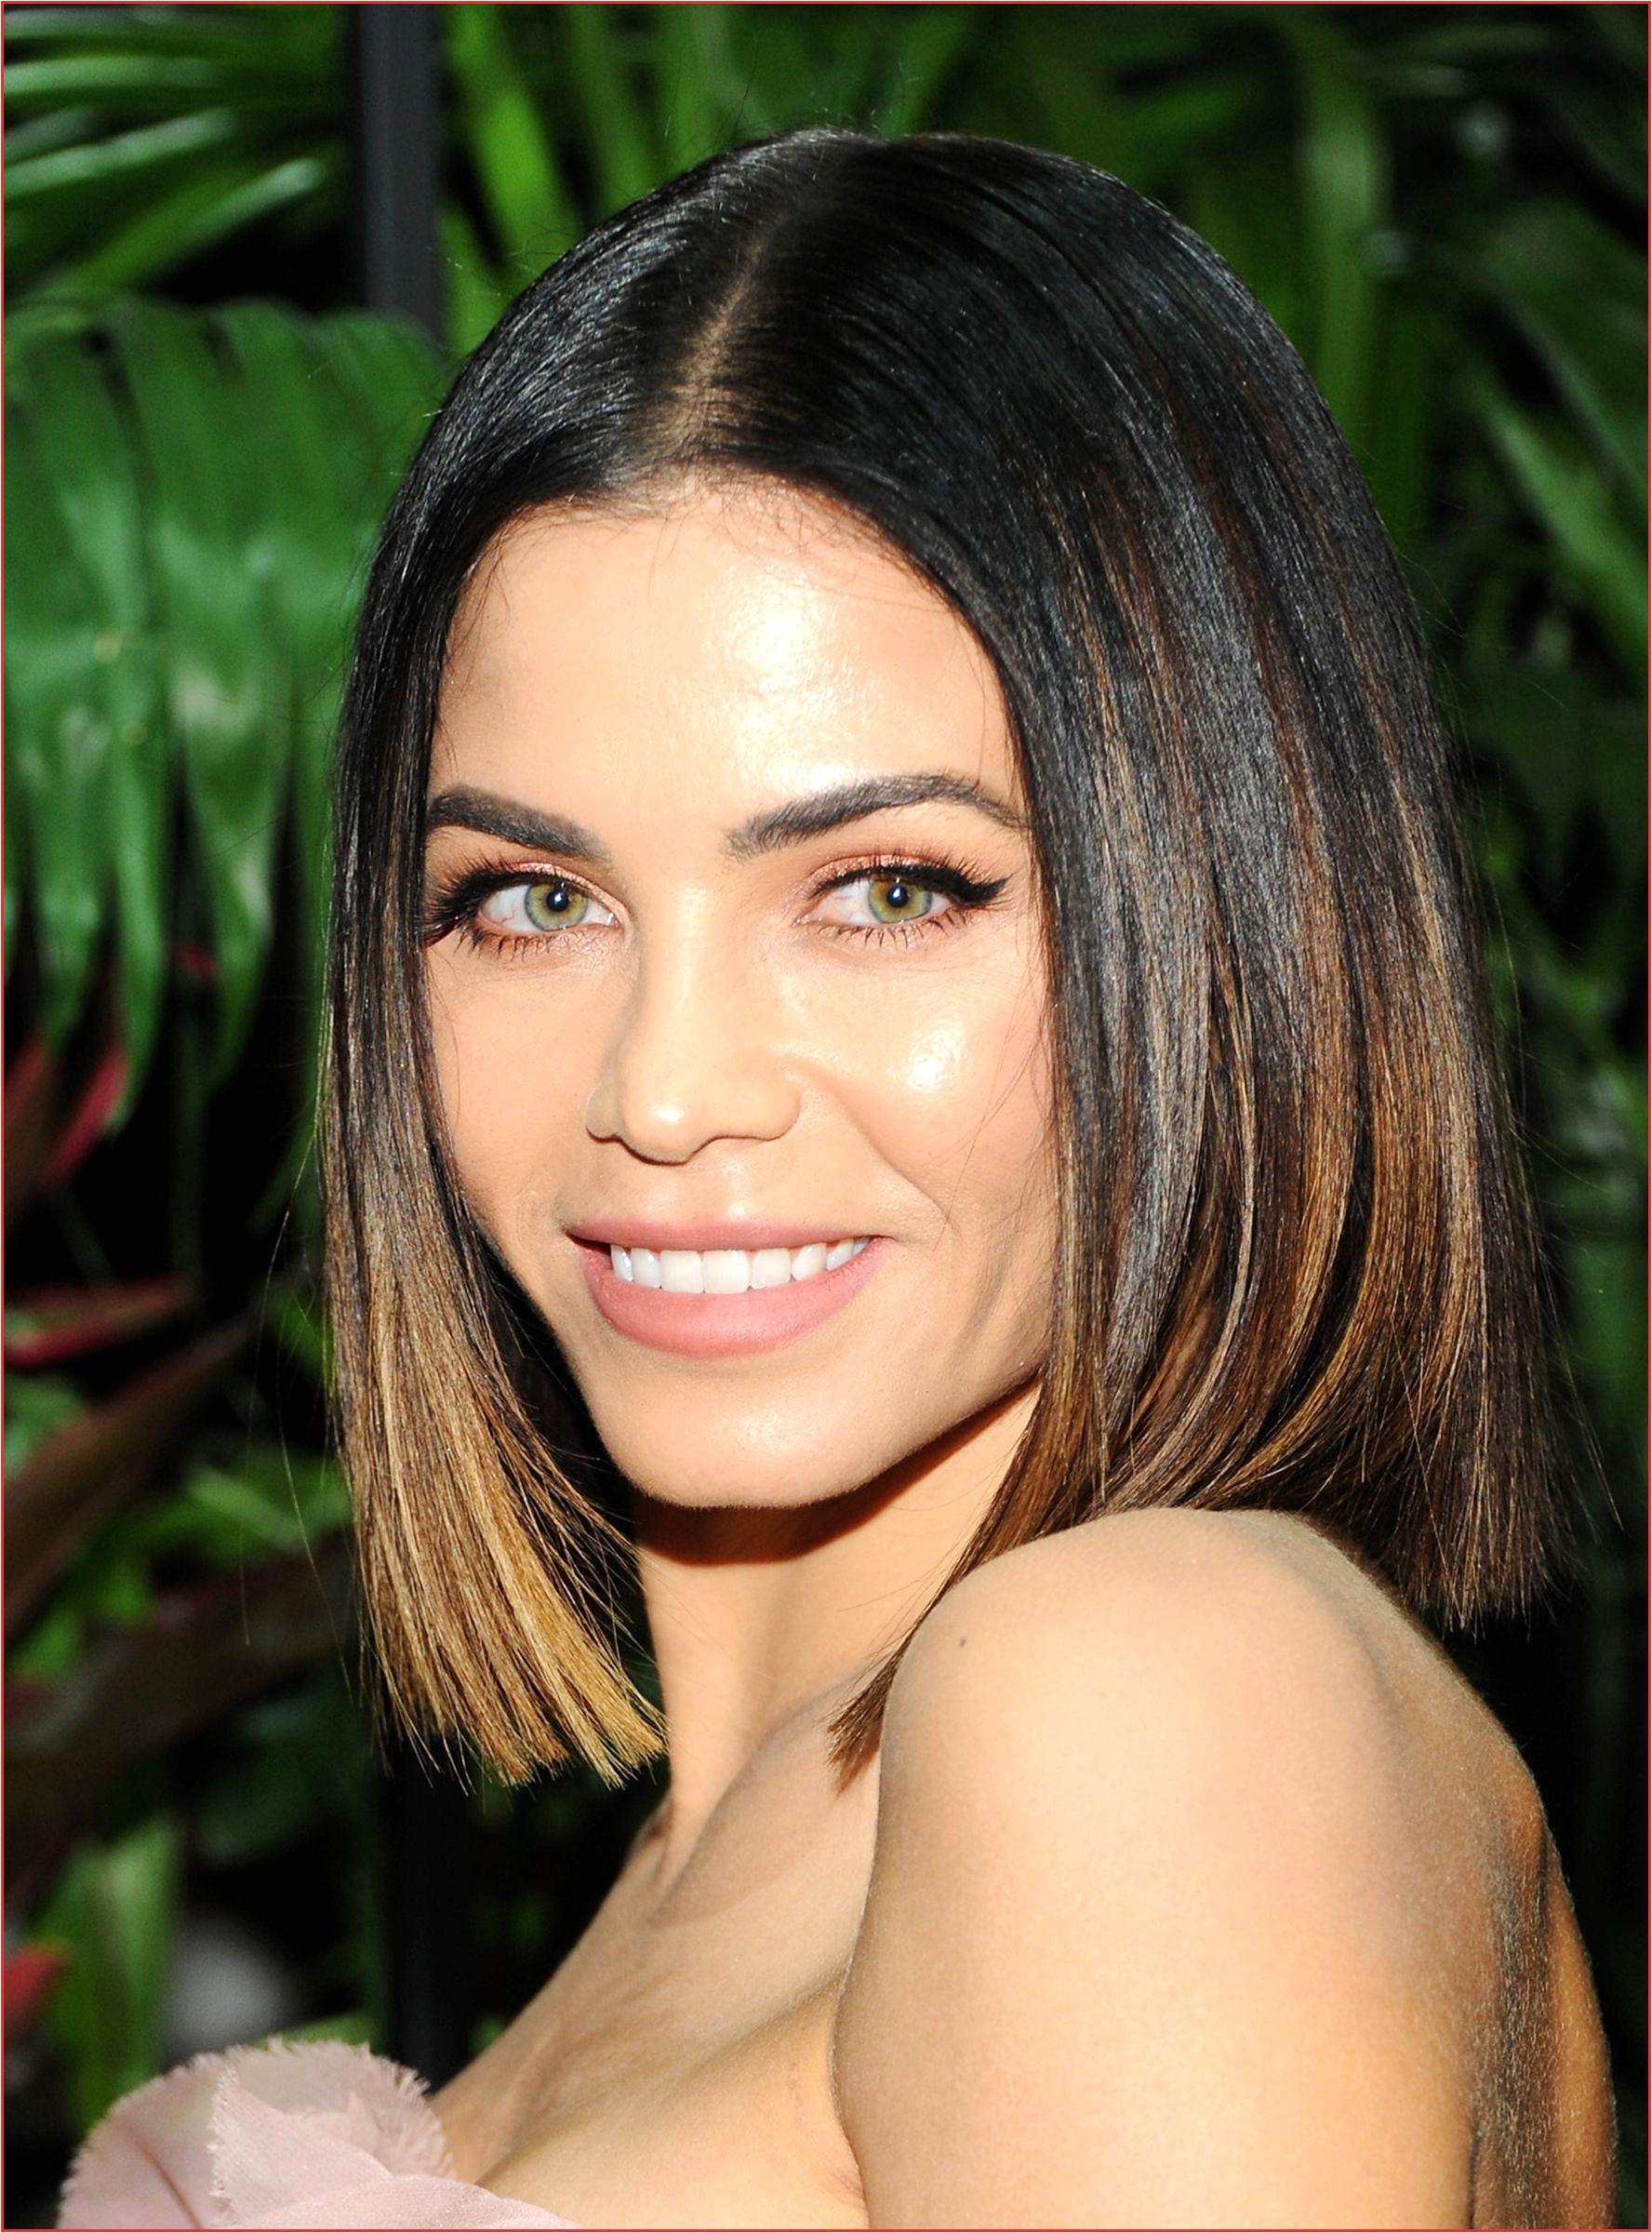 Hair Highlights Short Hair New Trend Hair Cutting Beautiful formal Updos for Short Hair Great